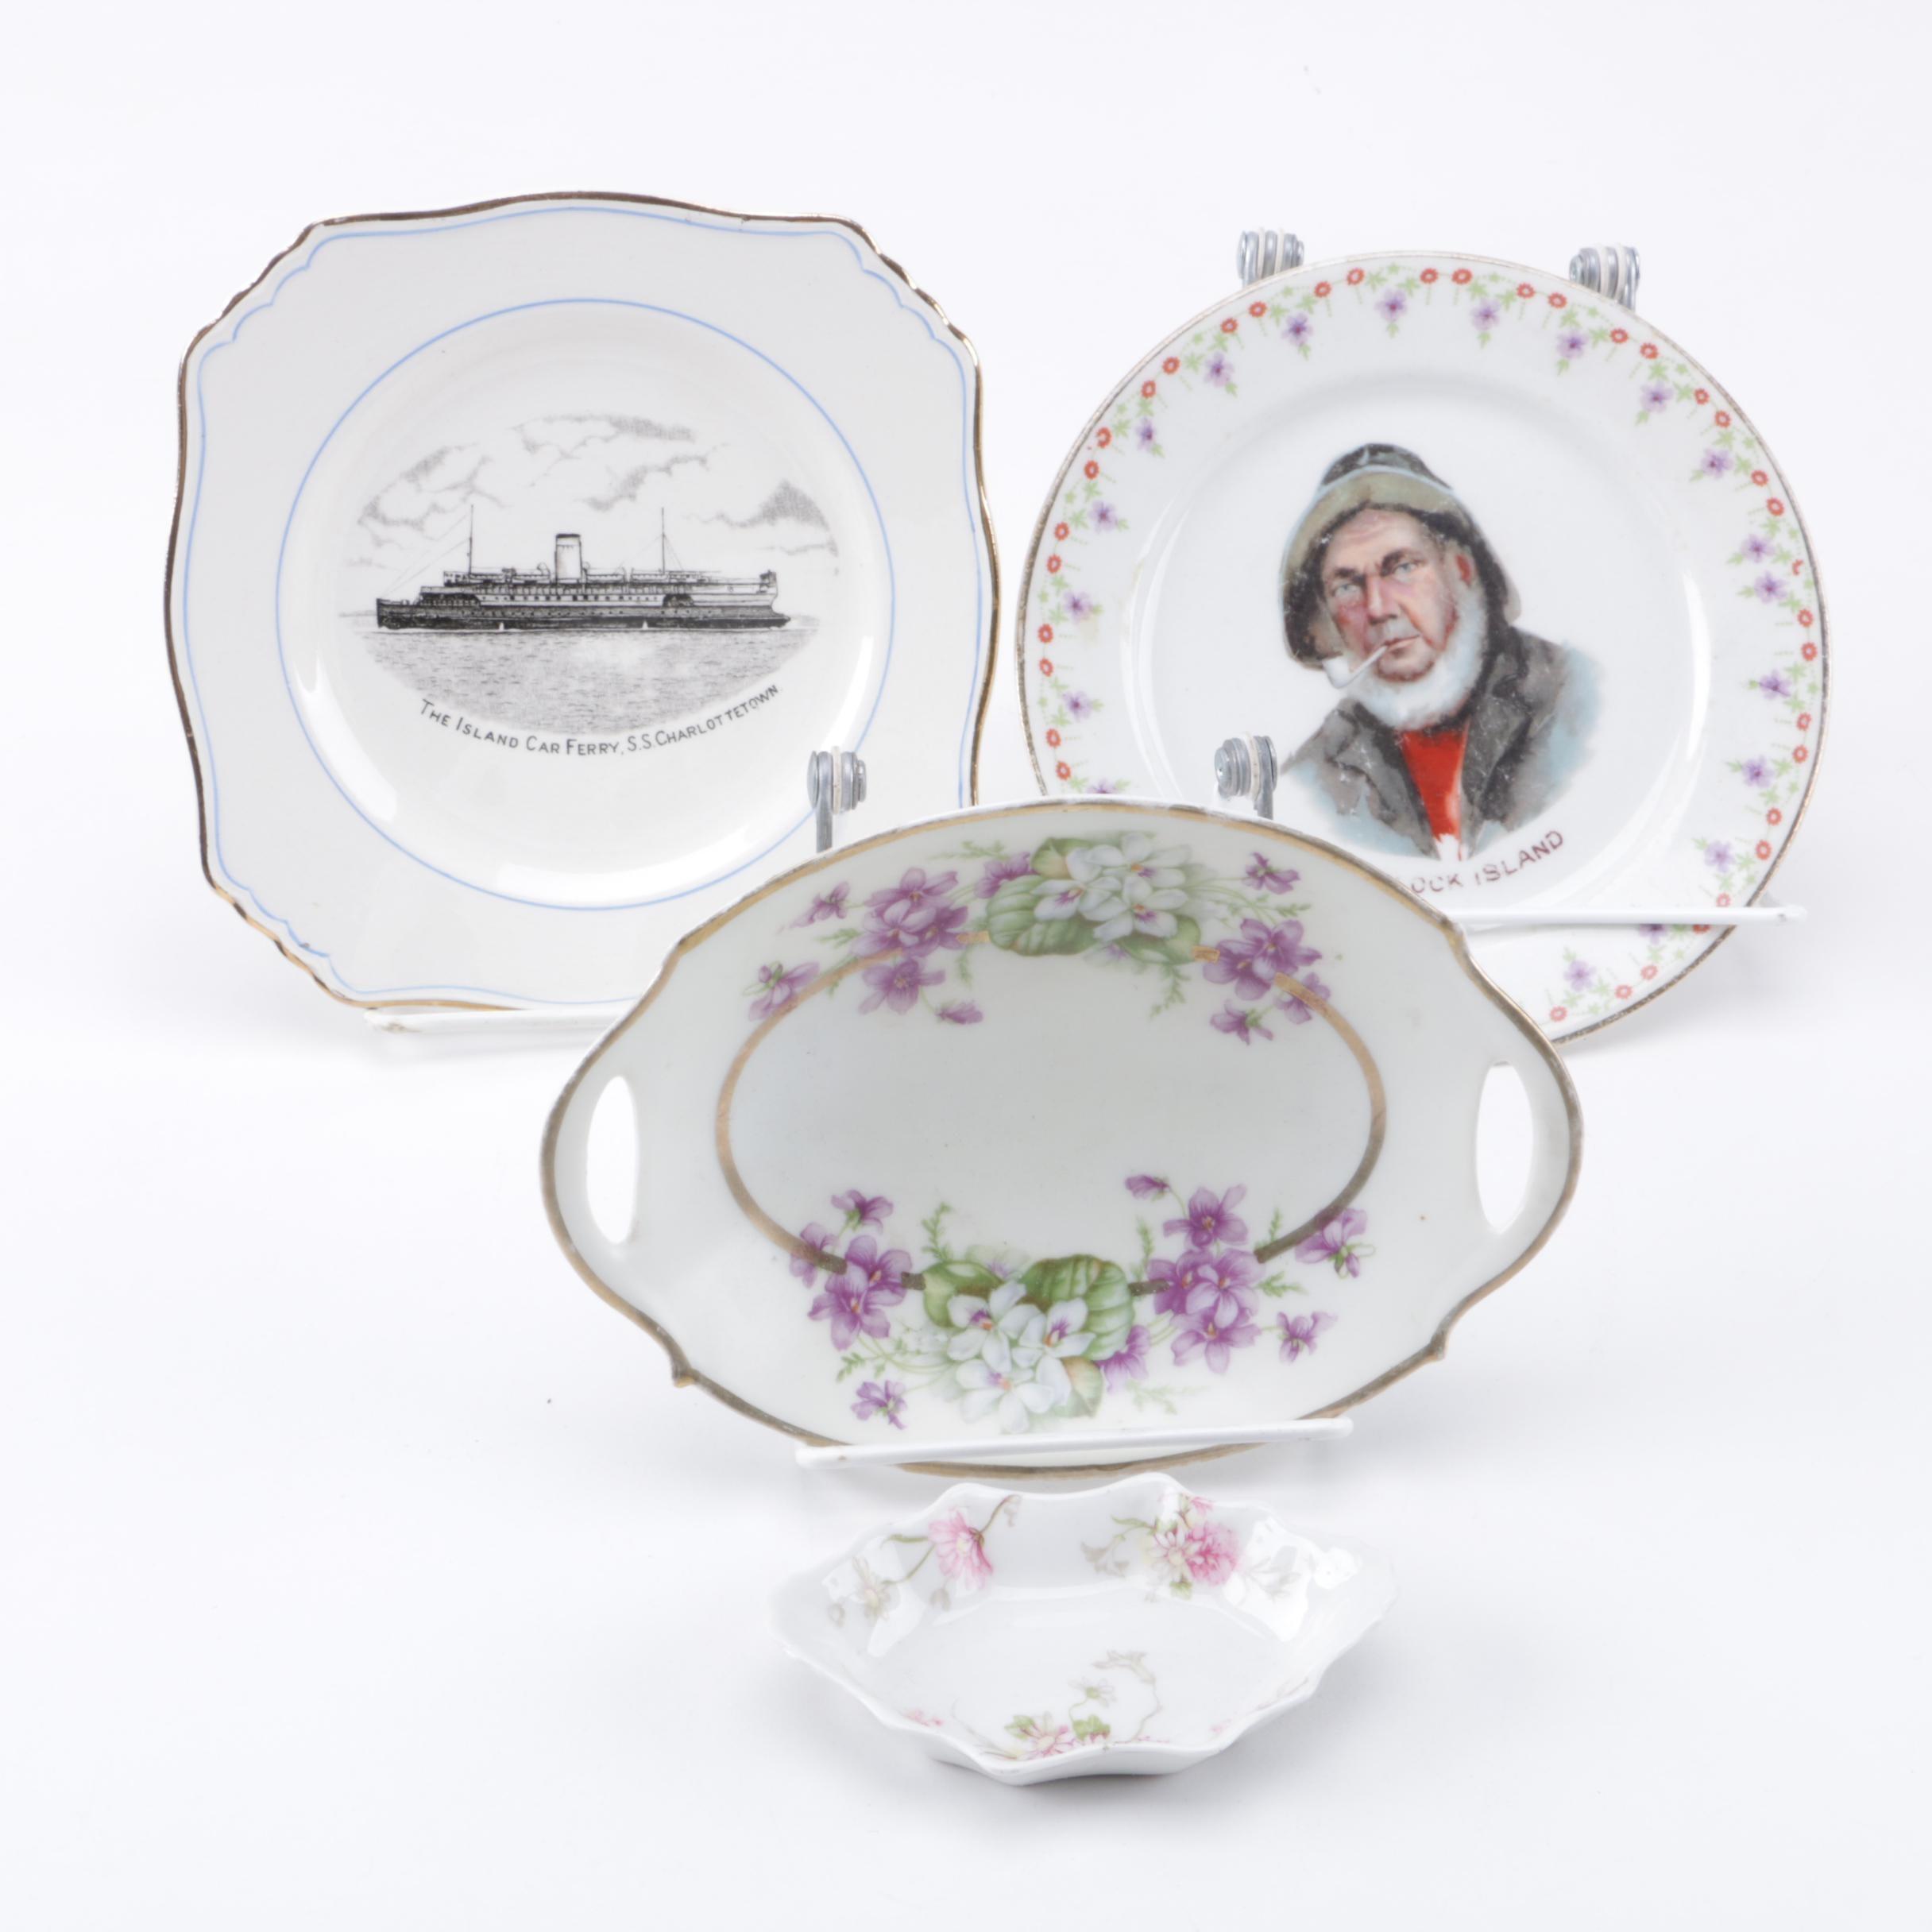 Porcelain Plates Including Limoges and Royal Winton Grimwades